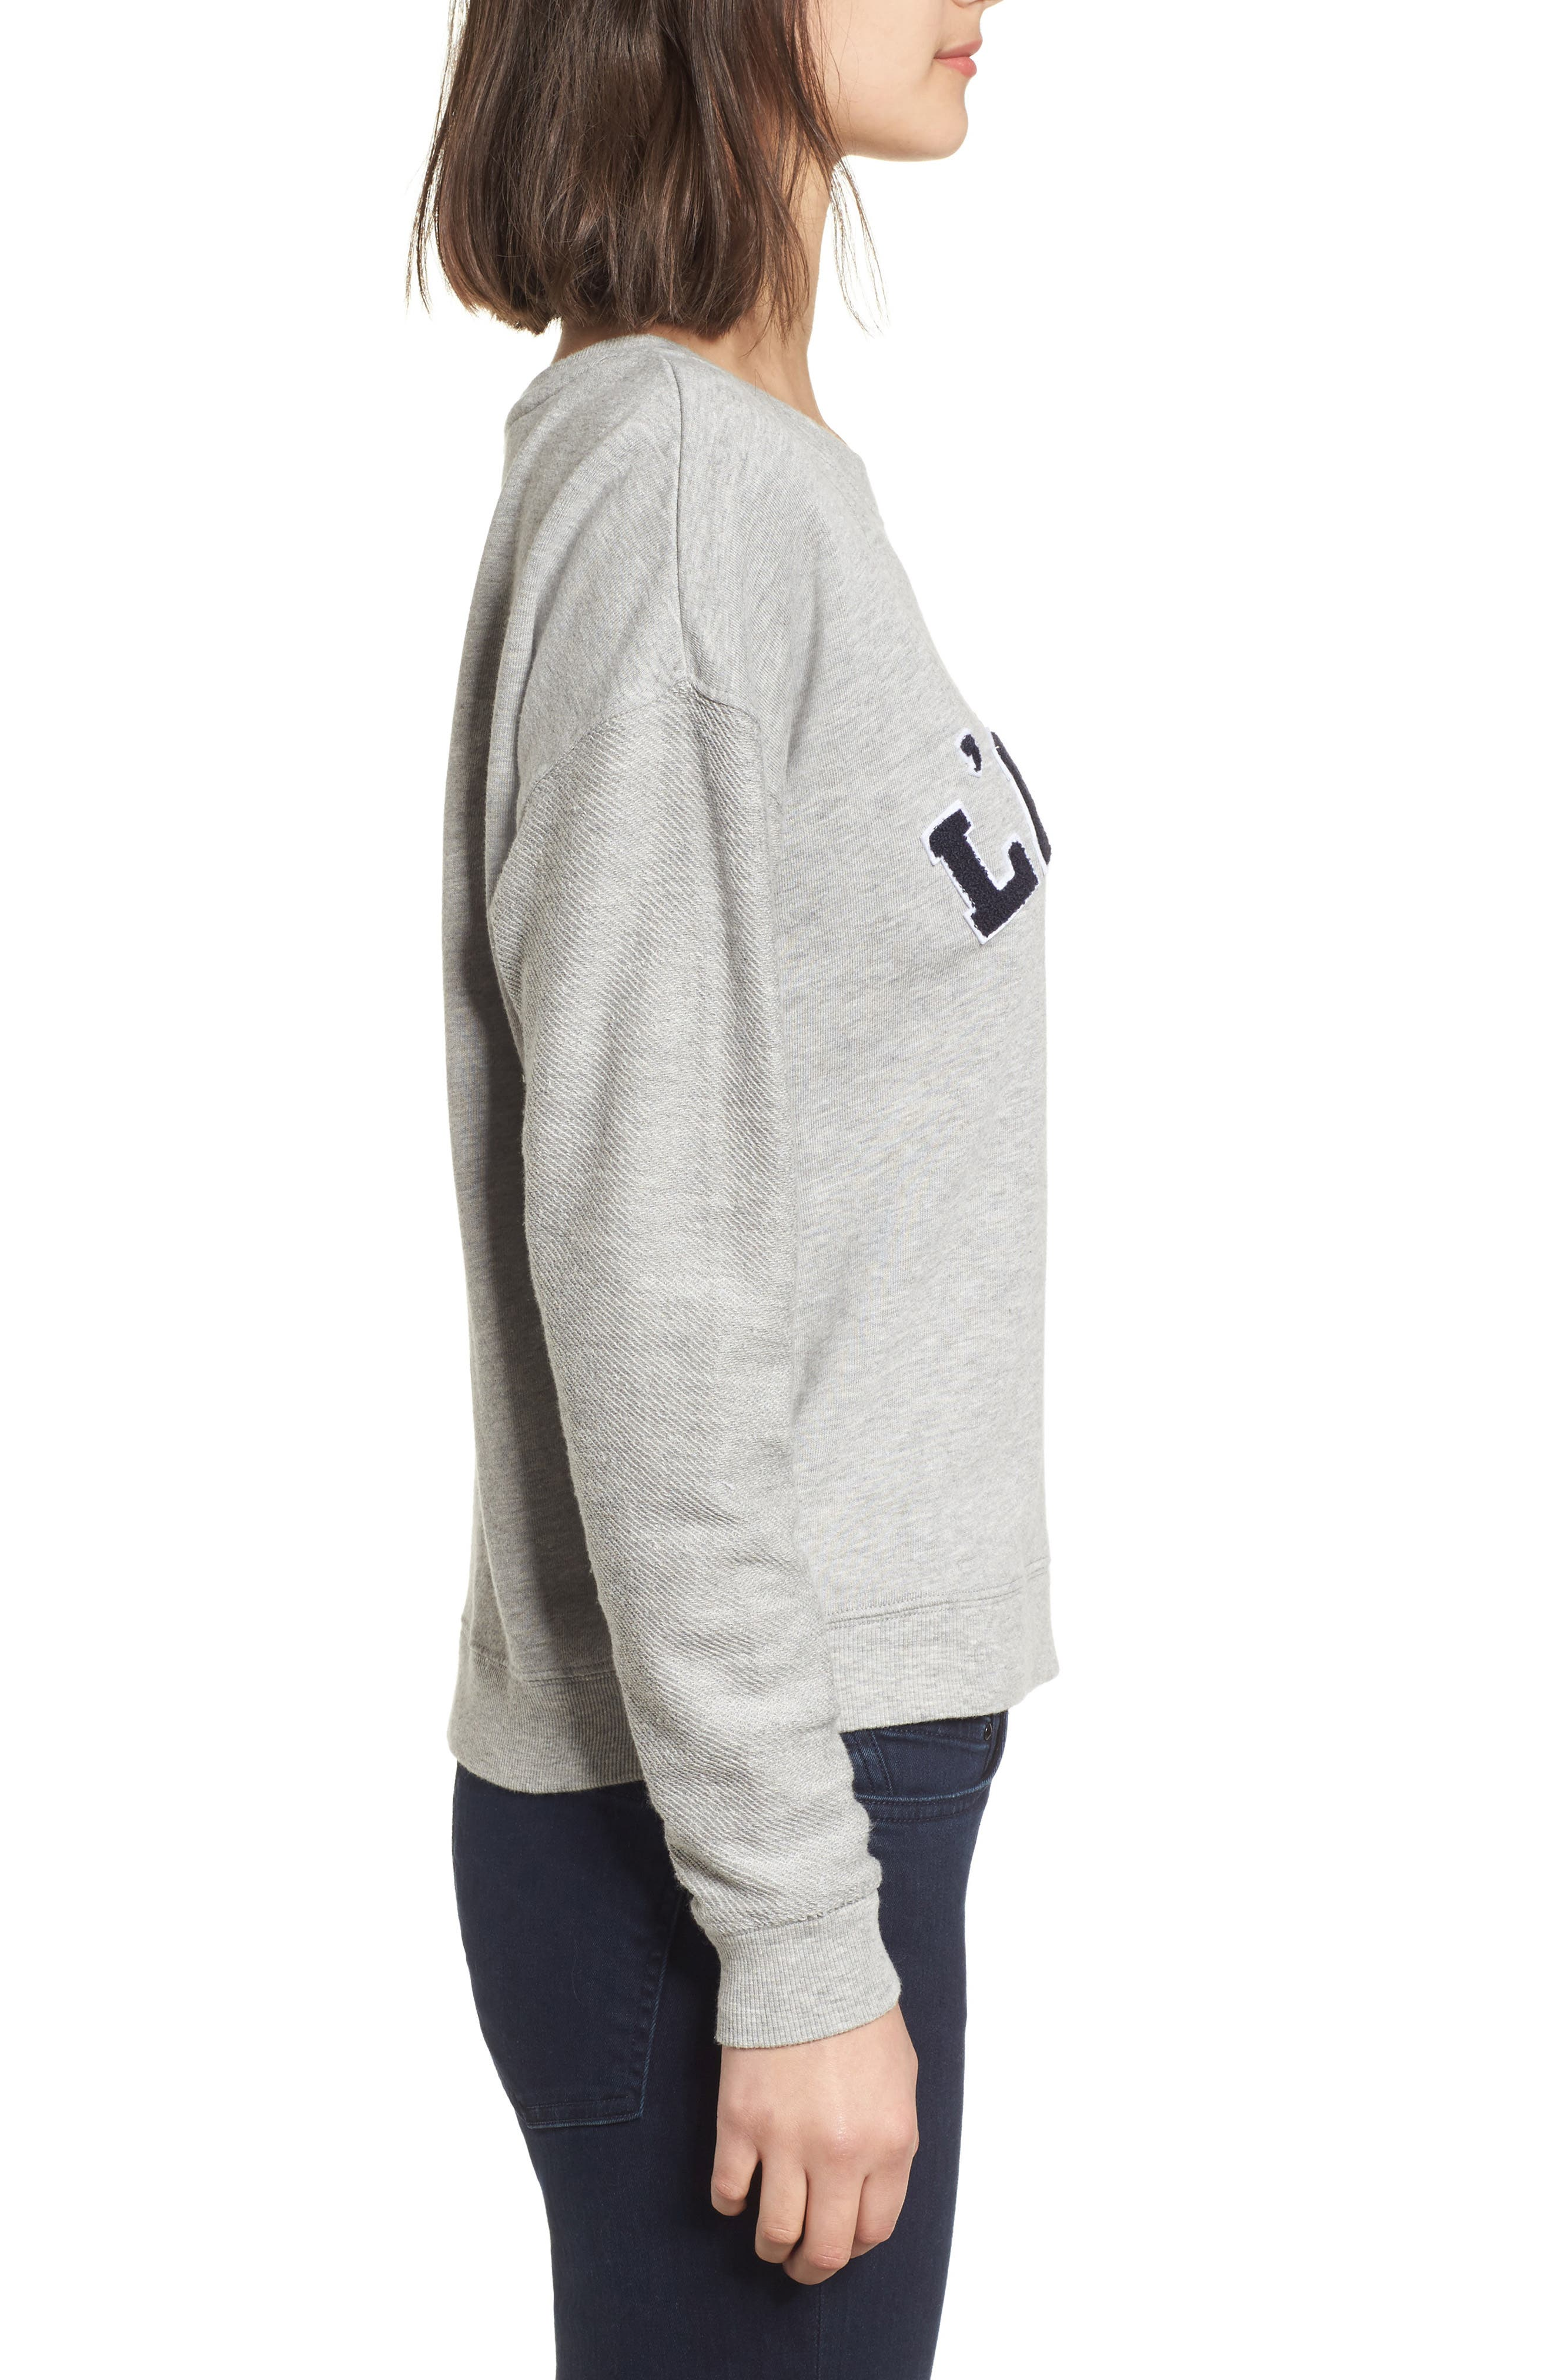 Kelli Paris Sweatshirt,                             Alternate thumbnail 3, color,                             032